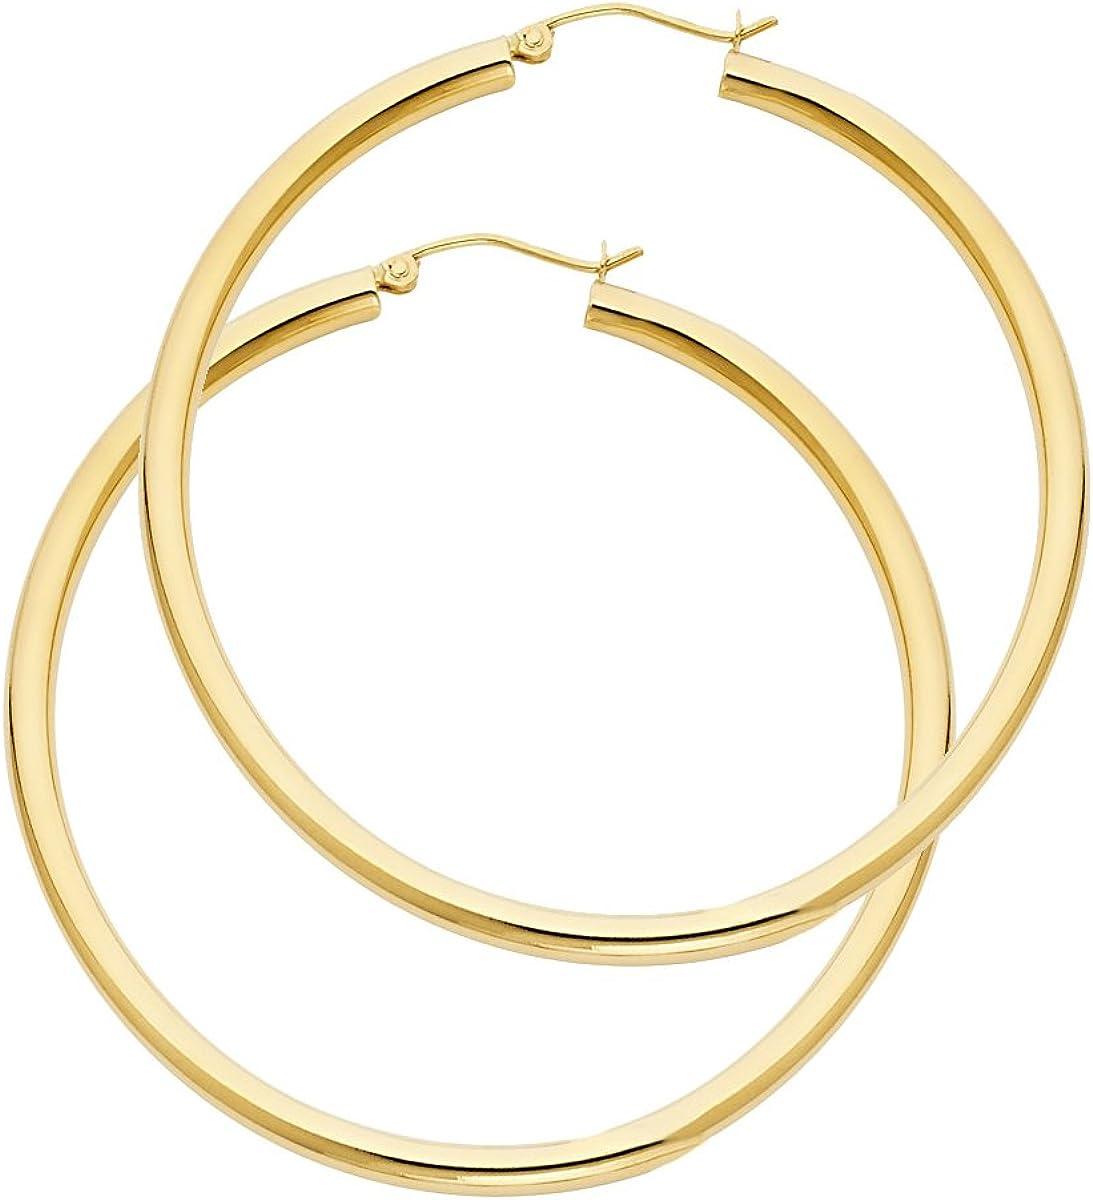 14k Yellow Gold 3mm Thickness Hinged Plain Hoop Earrings - Diameter - 55mm